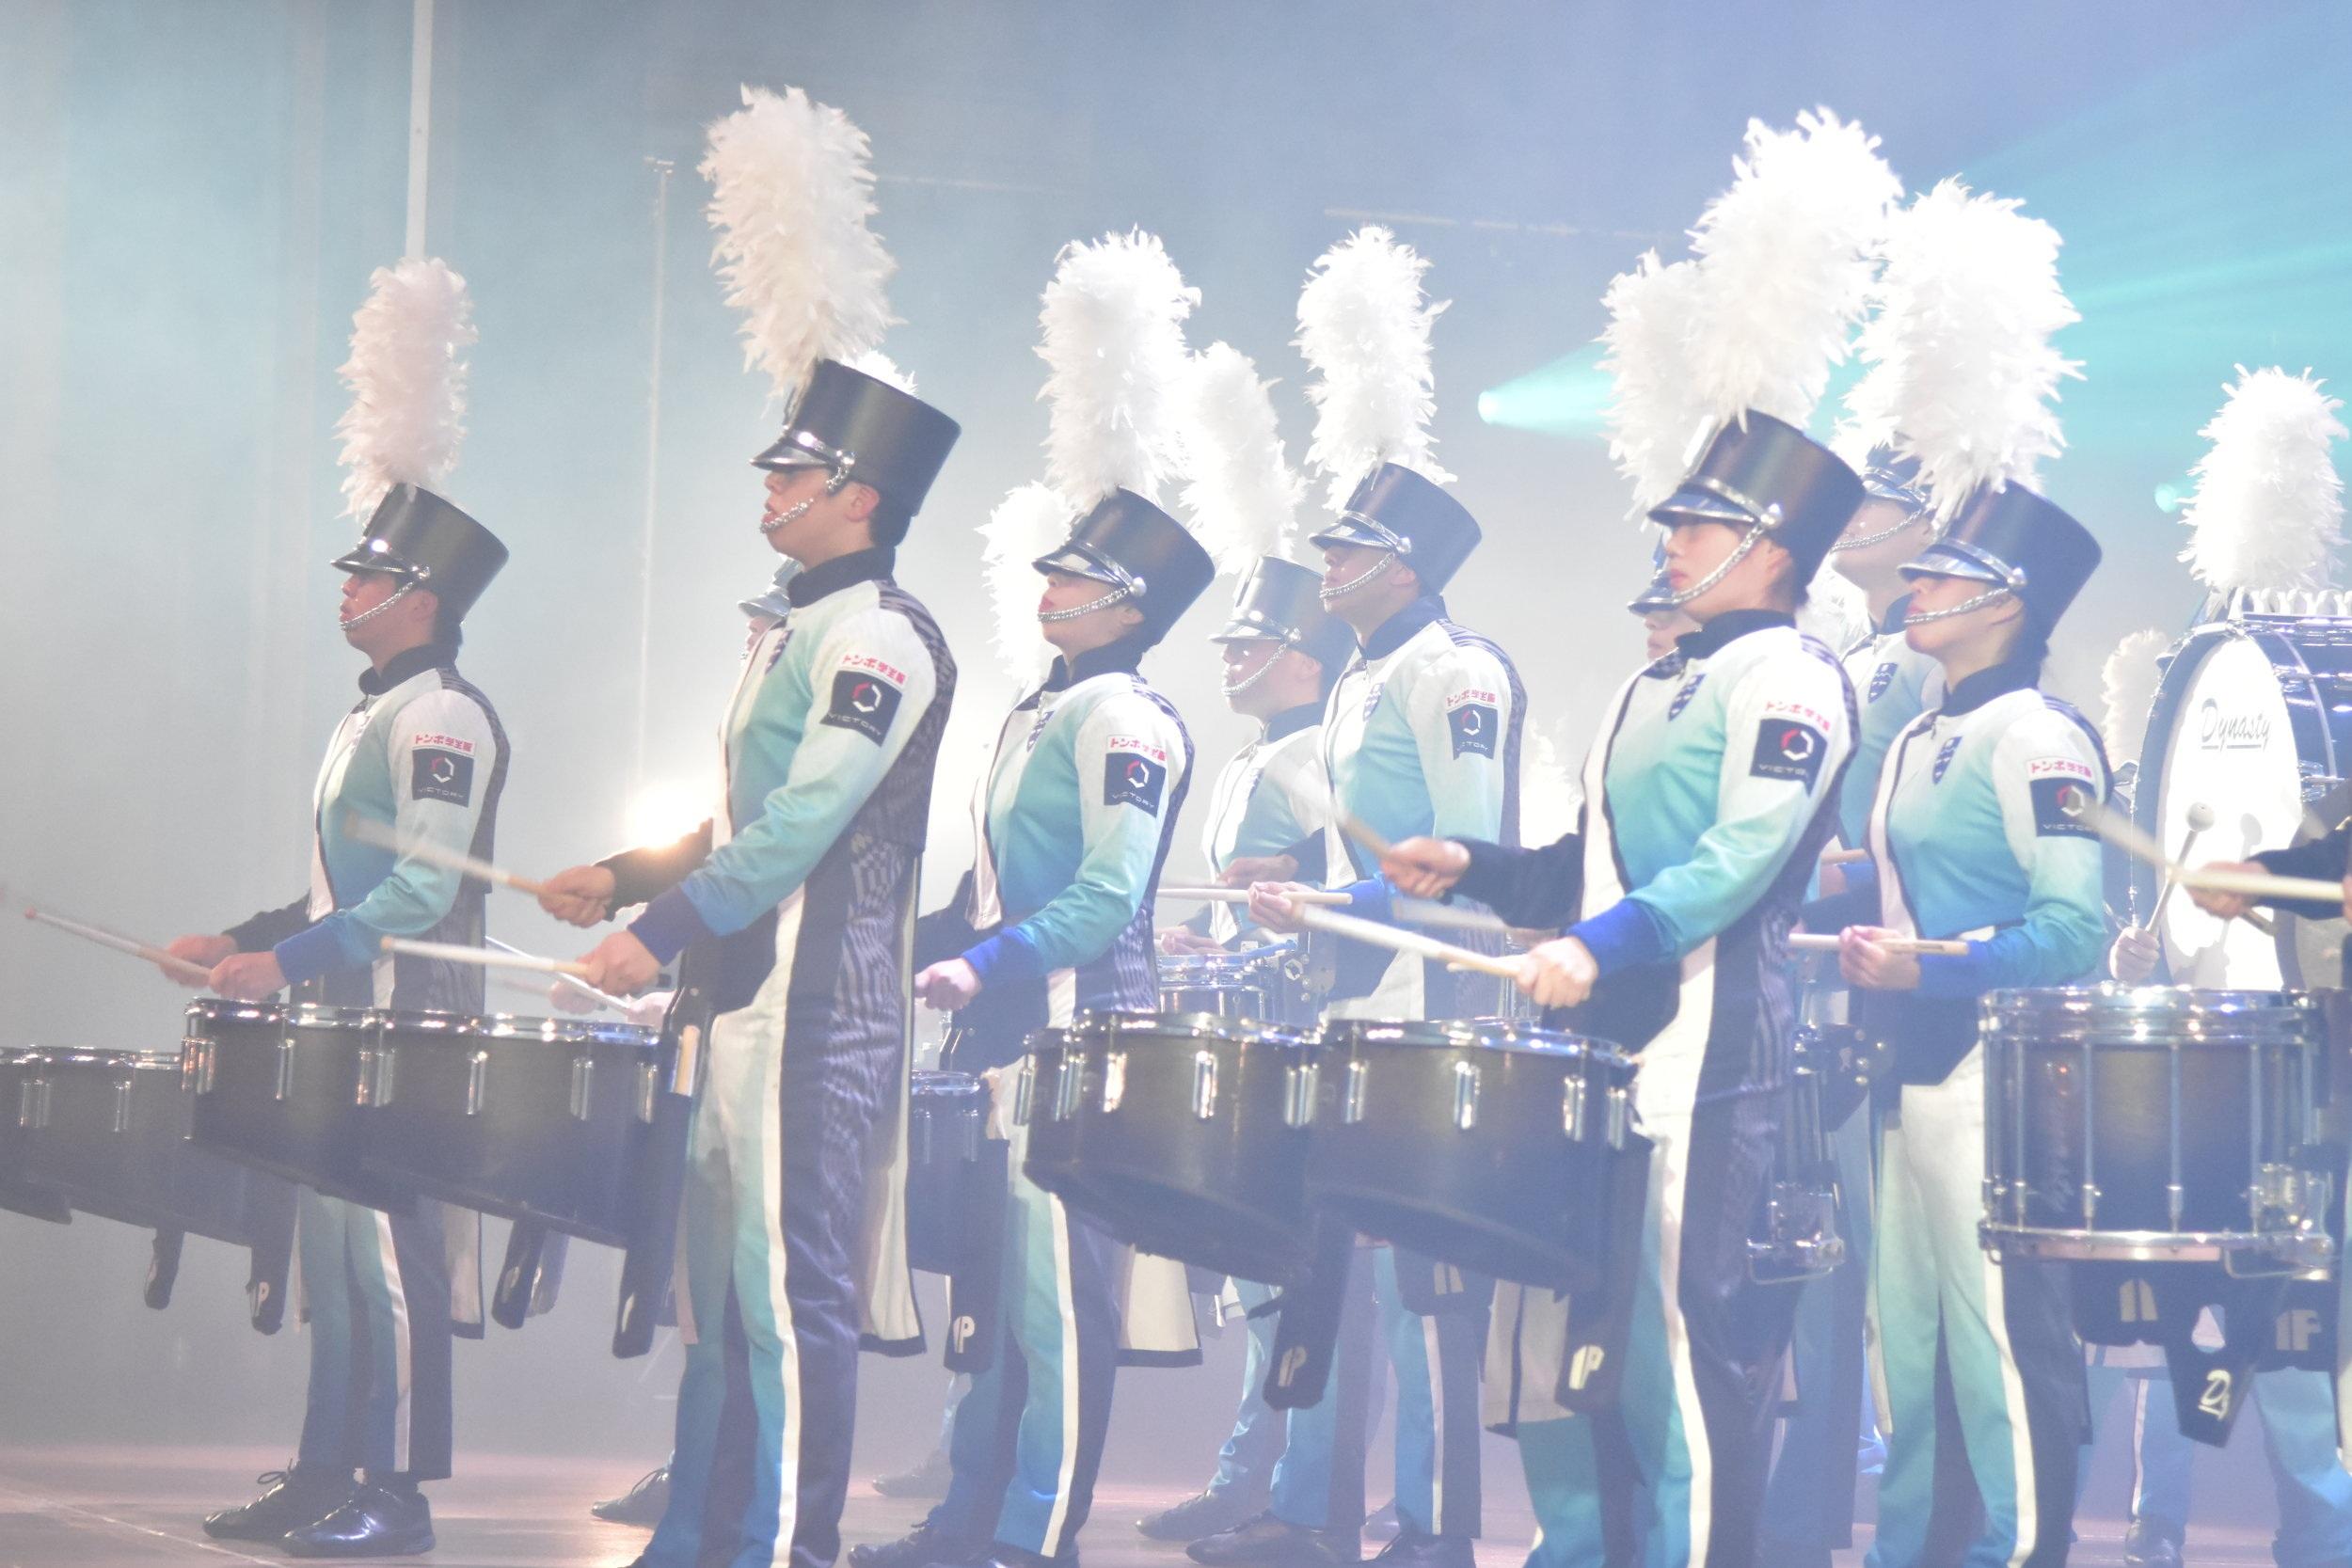 International Pacific University Marching Band, Japan